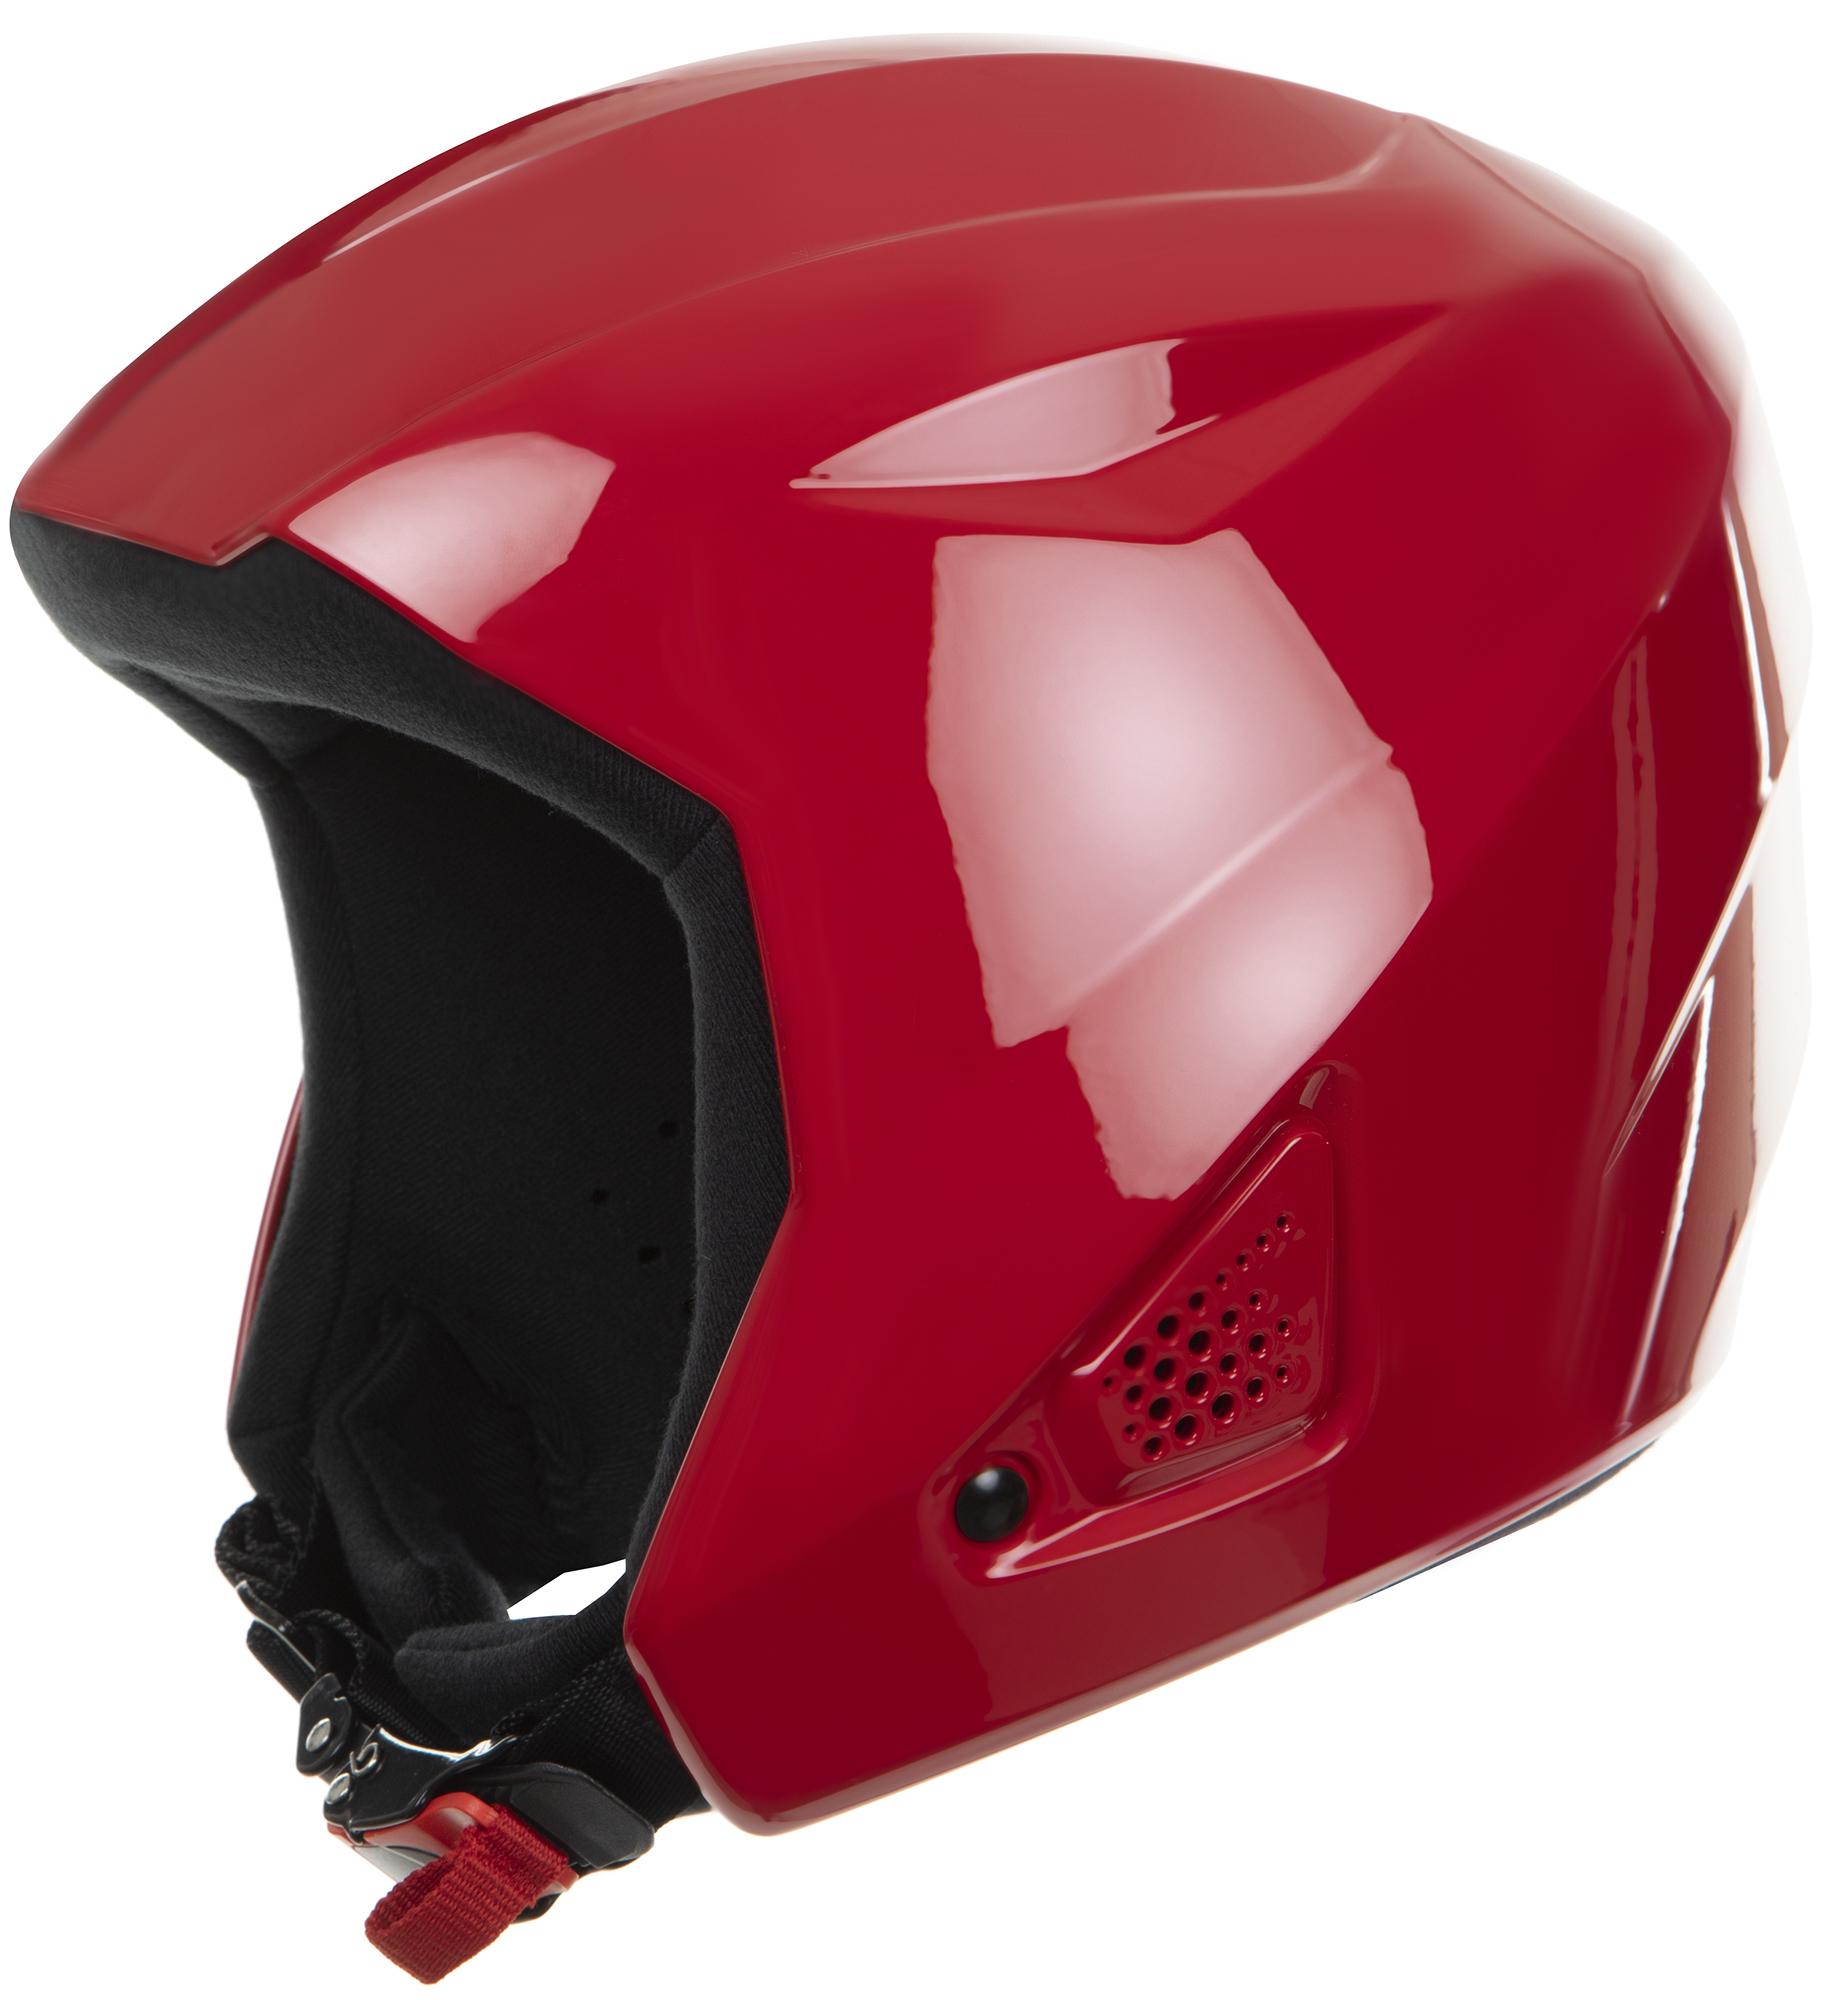 купить Dainese Шлем детский Dainese Snow Team по цене 3799 рублей